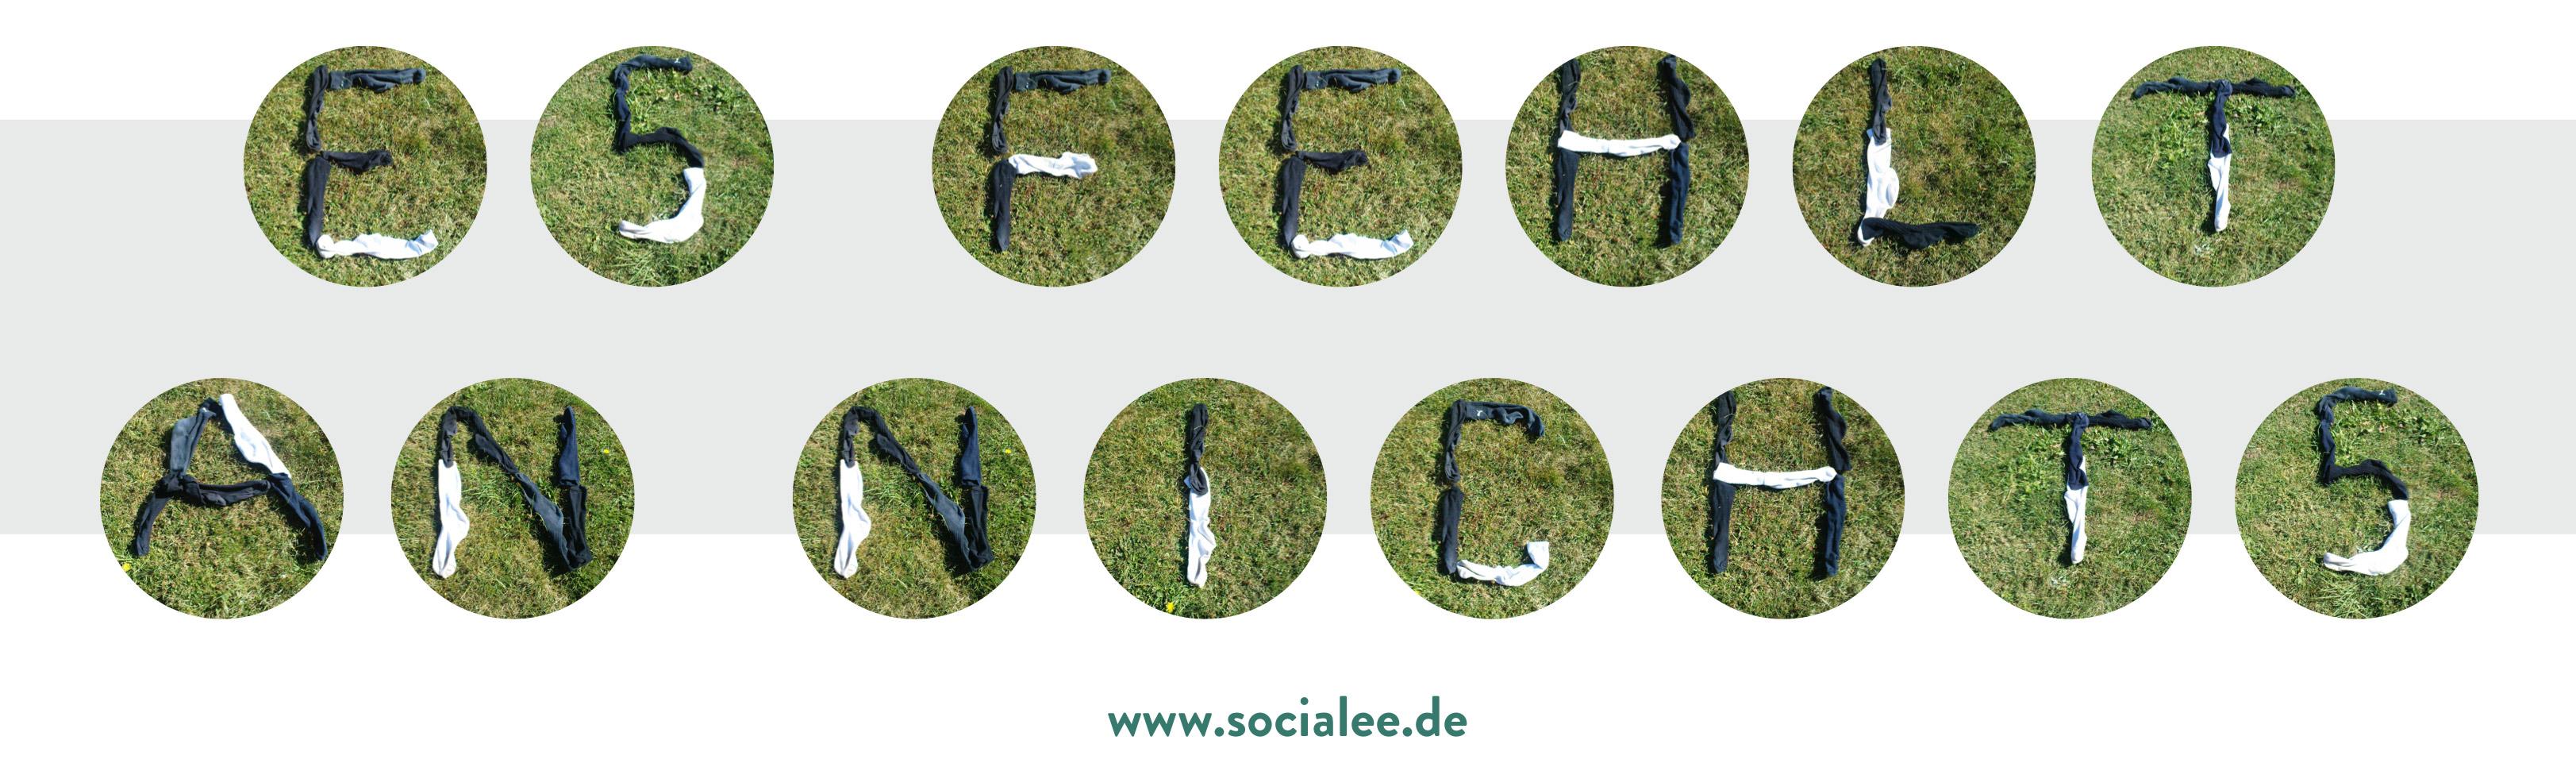 Socialee_Socks